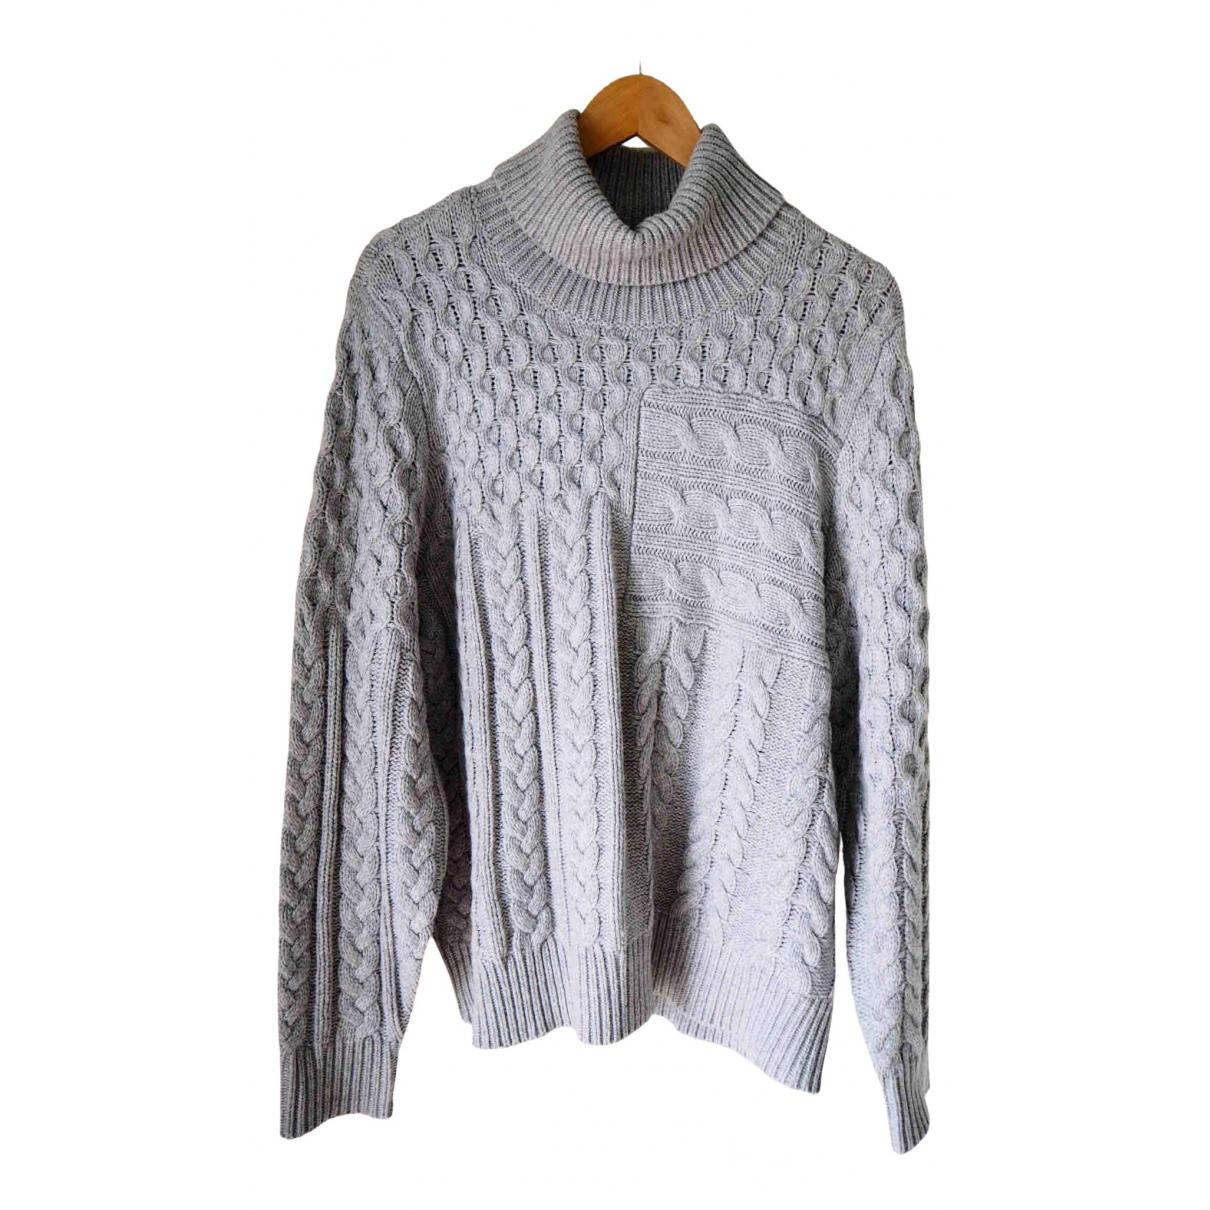 Michael Kors \N Grey Knitwear for Women XL International